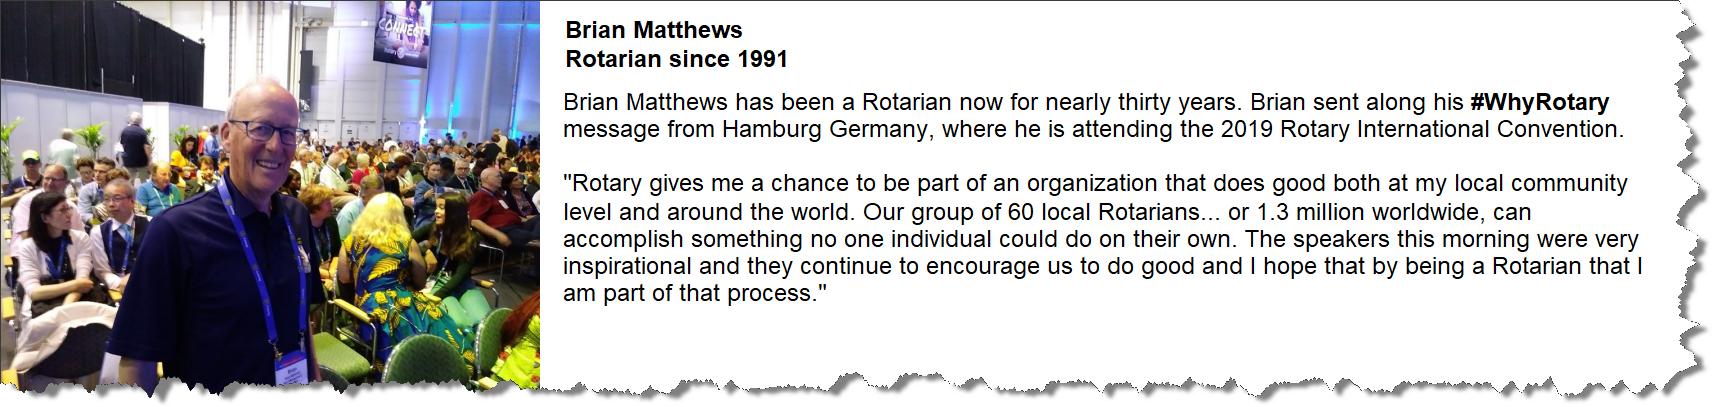 5 - Brian Mathews